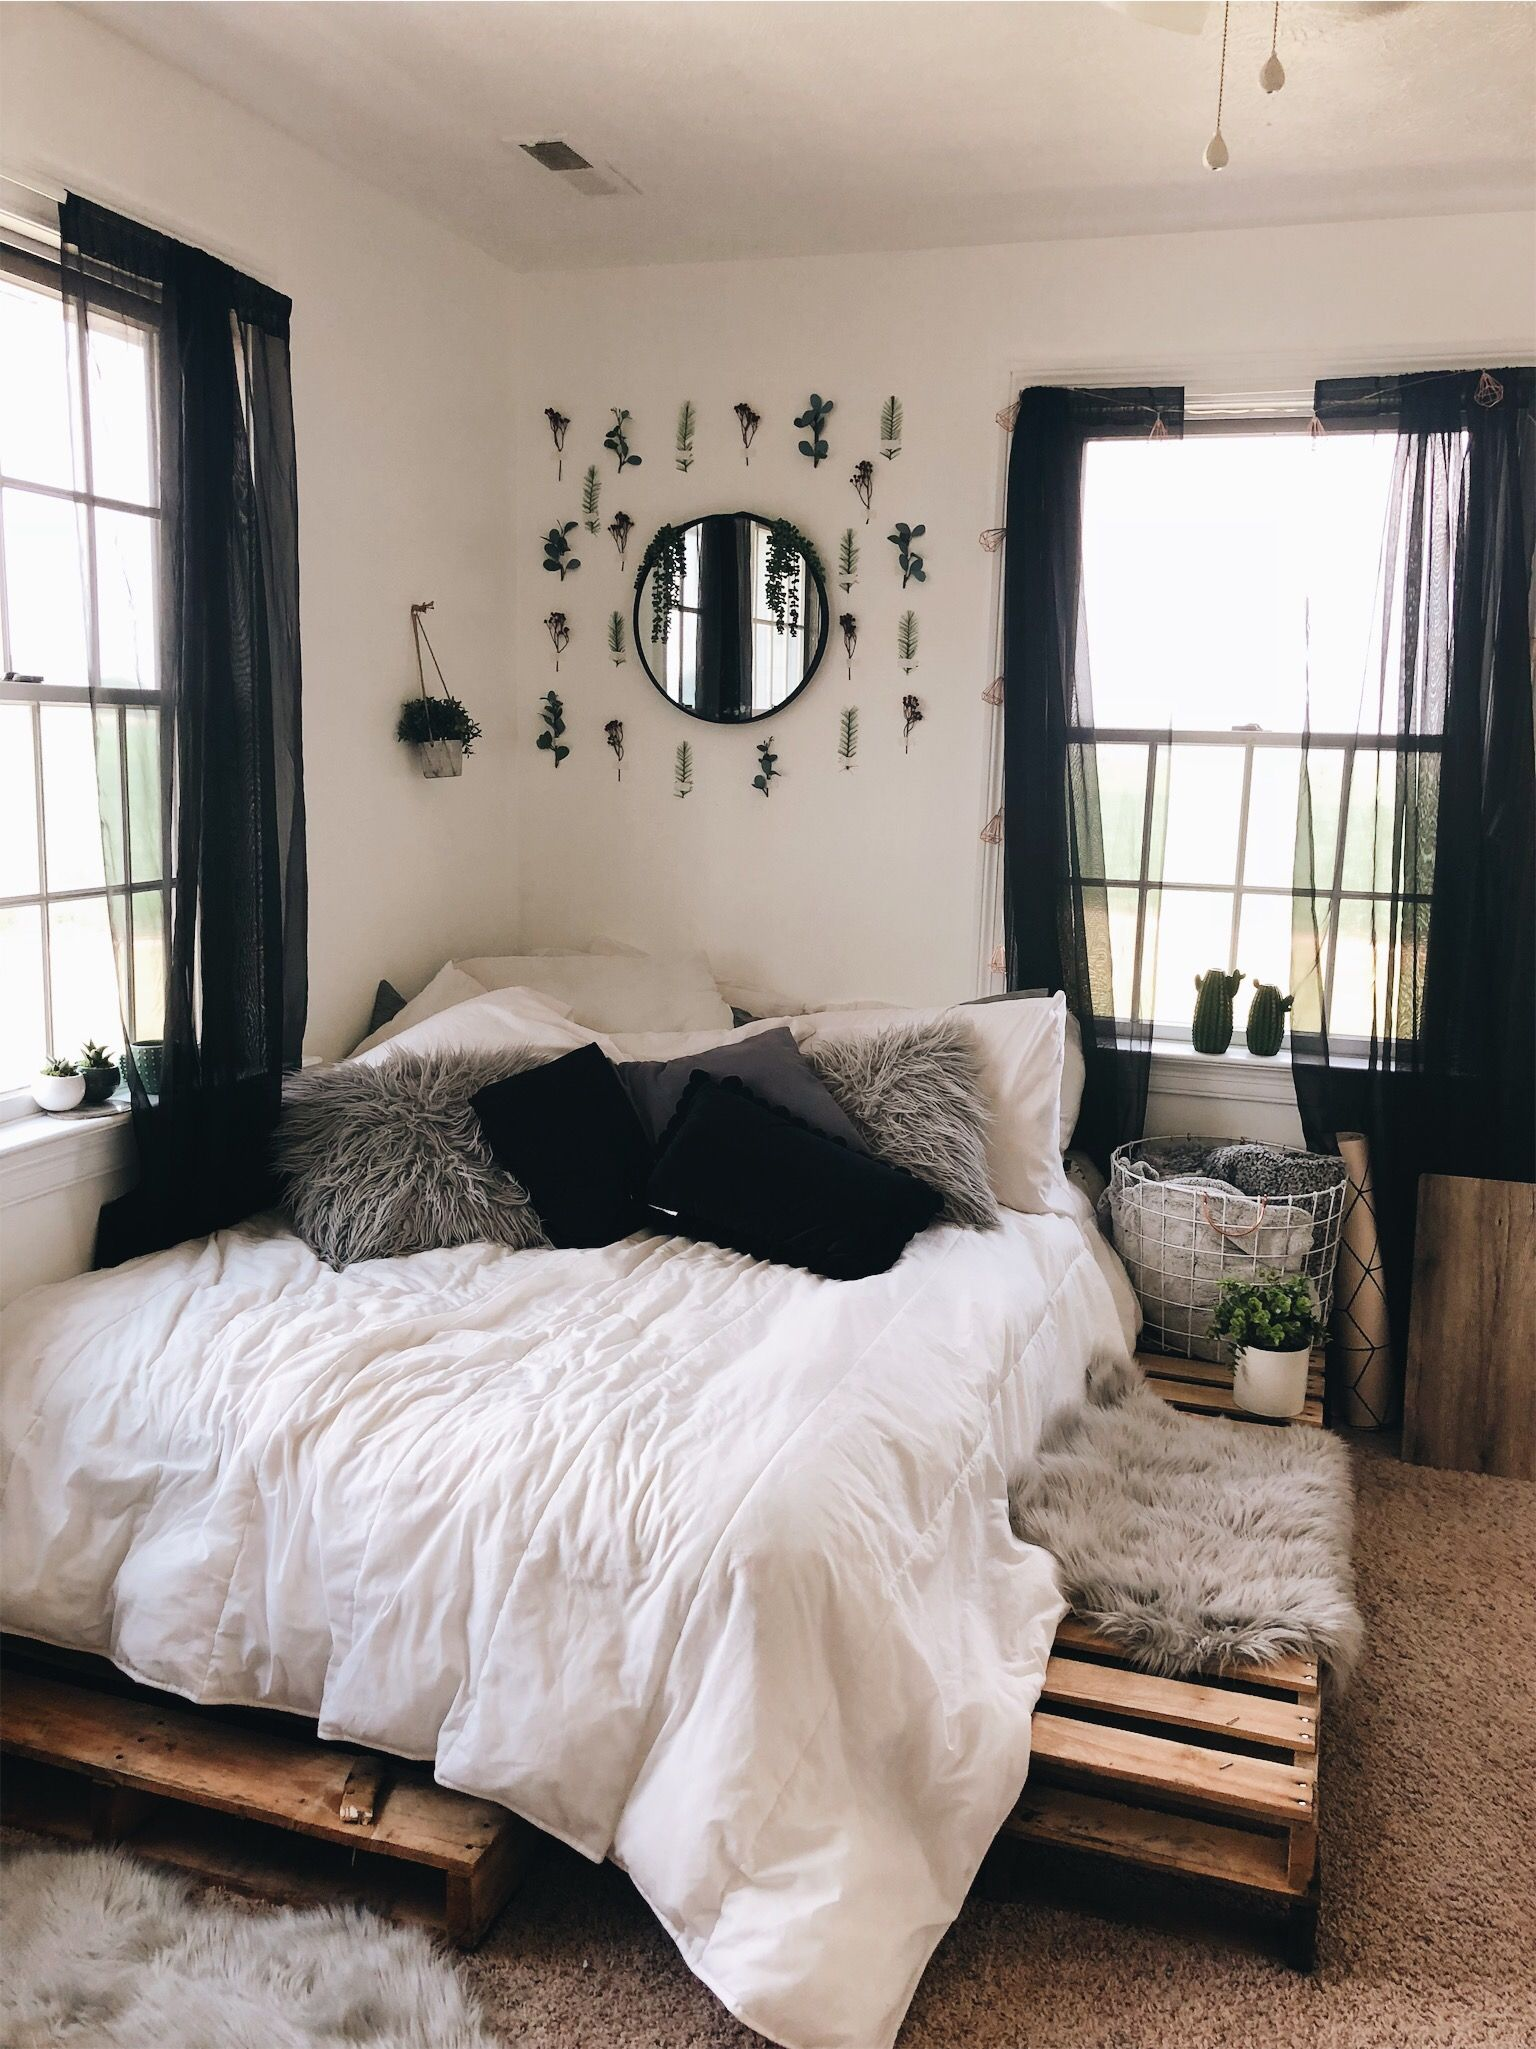 ROOM INSPO ! cozy #roomideas #roomdesign | Aesthetic rooms ...